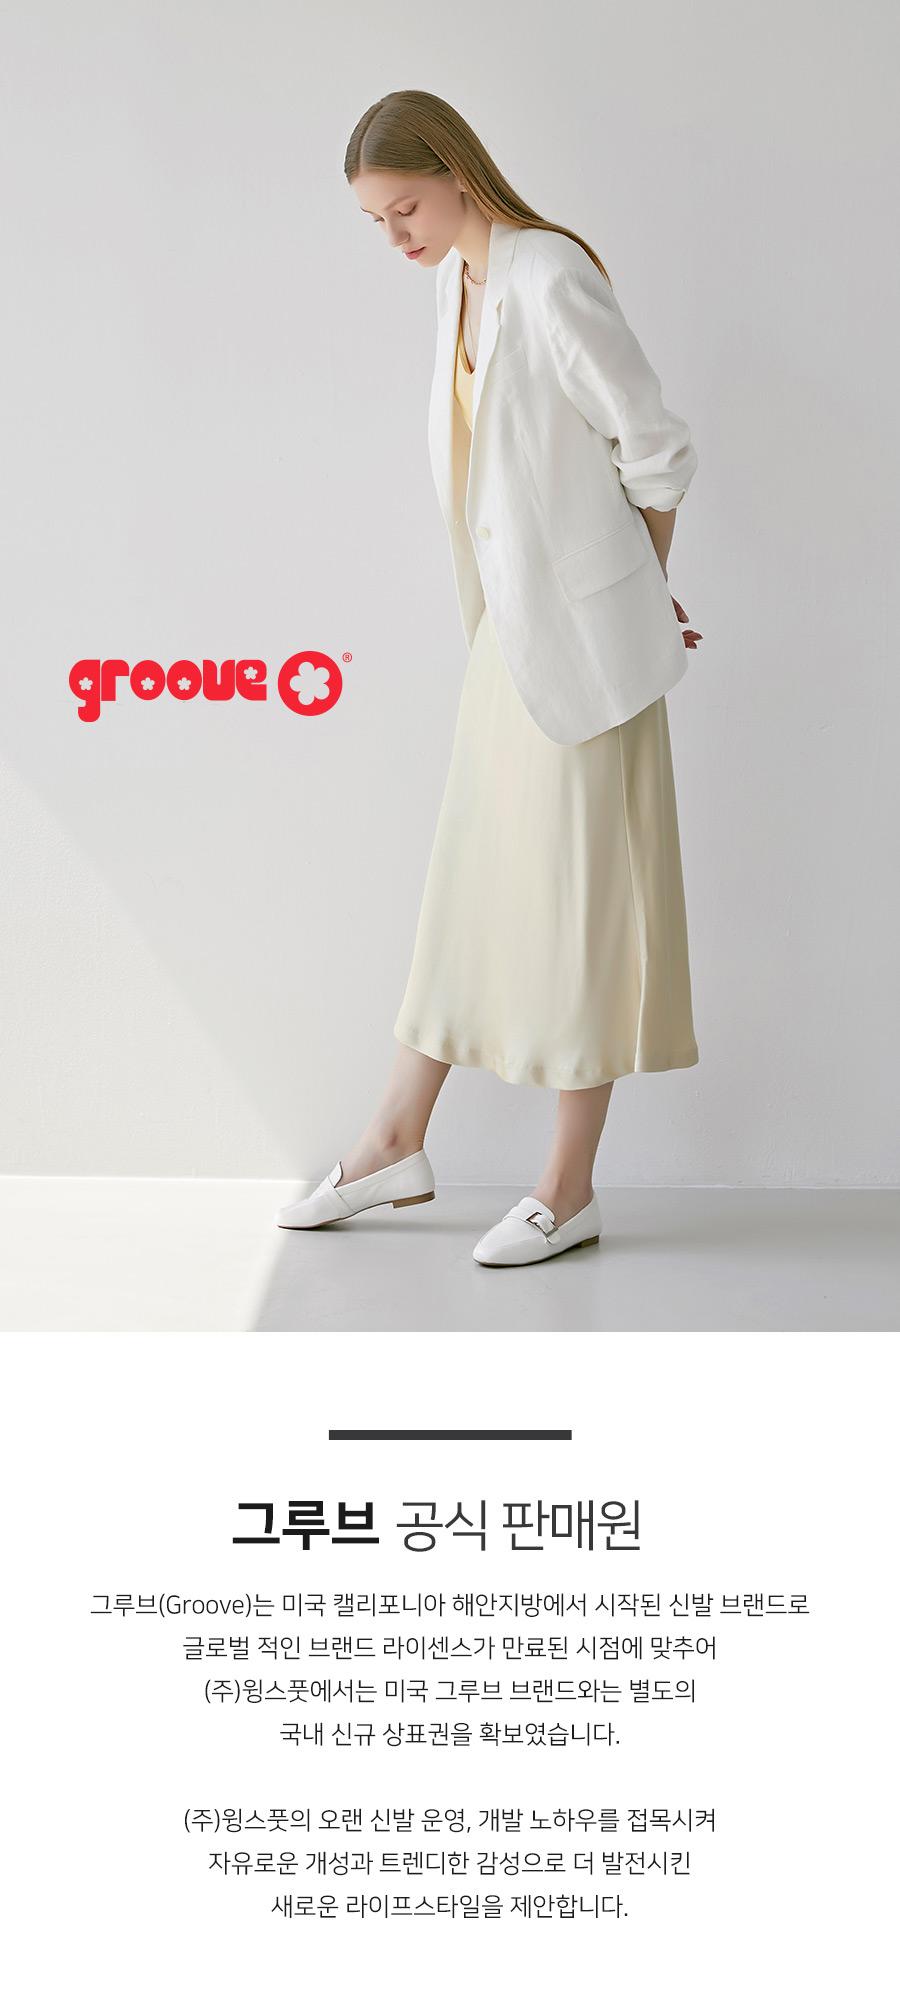 groove1.jpg